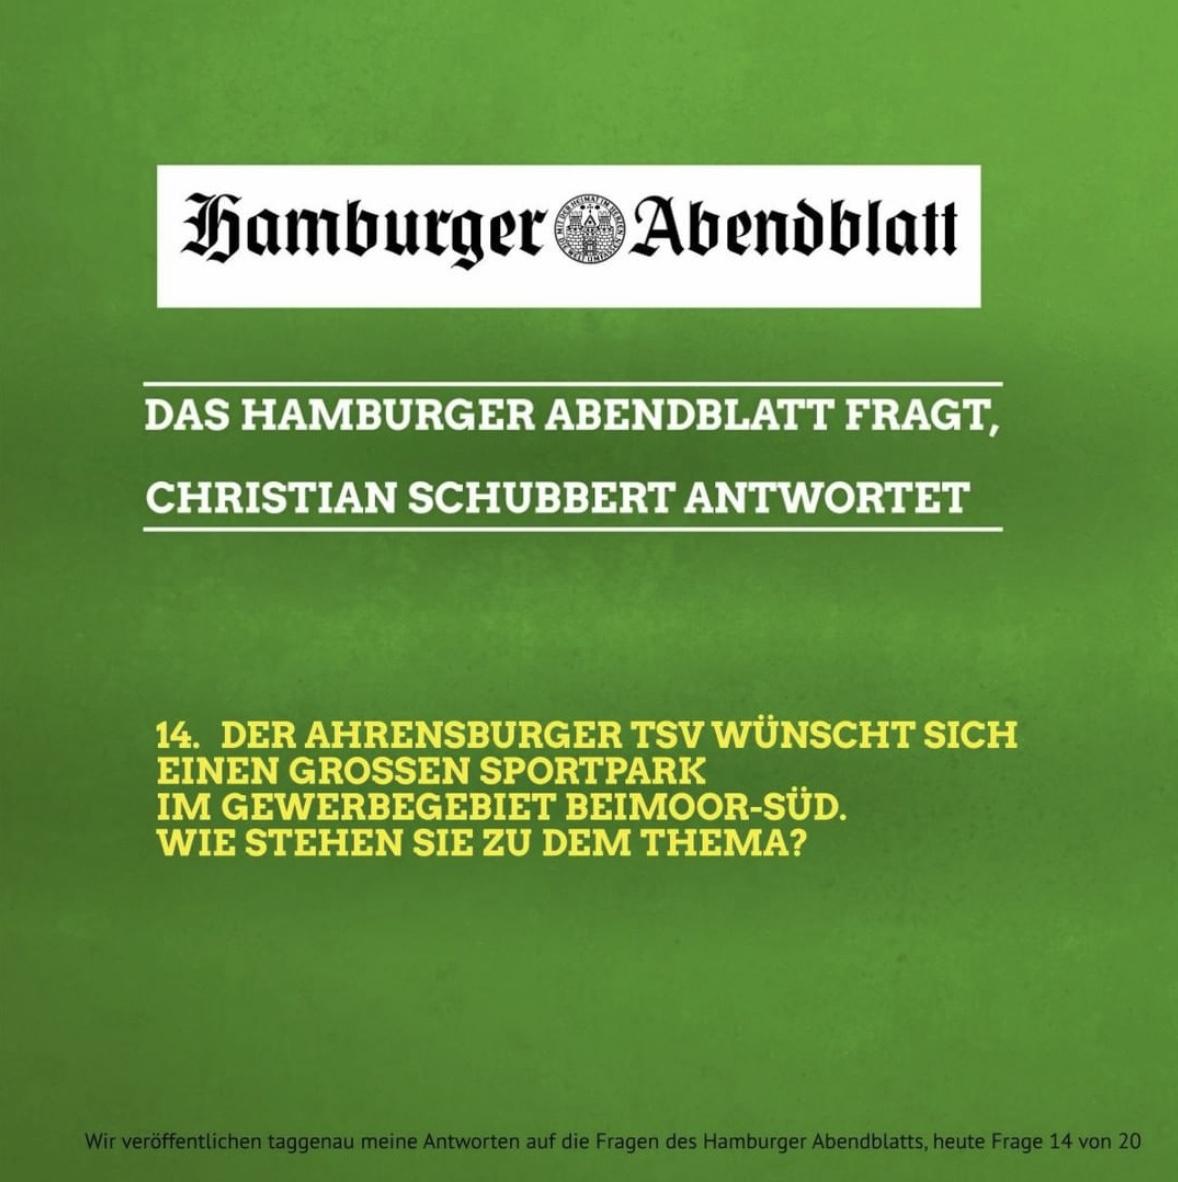 Das Hamburger Abendblatt fragt, Christian Schubbert antwortet: 14. Der Ahrensburger TSV wünscht sich einen großen Sportpark im Gewerbegebiet Beimoor-Süd.